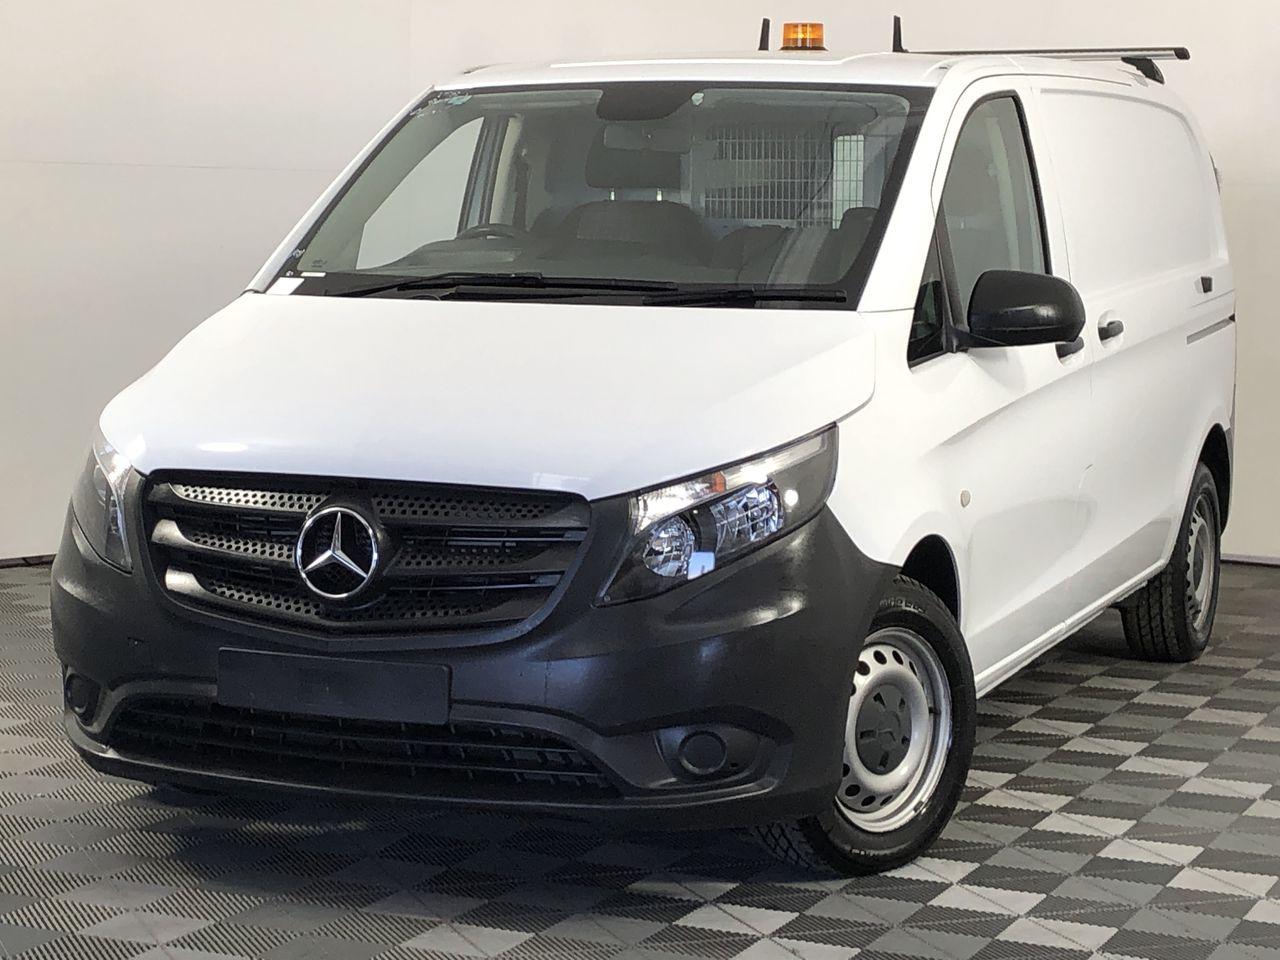 2016 Mercedes Benz Vito 111 CDI SWB Turbo Diesel Manual Van